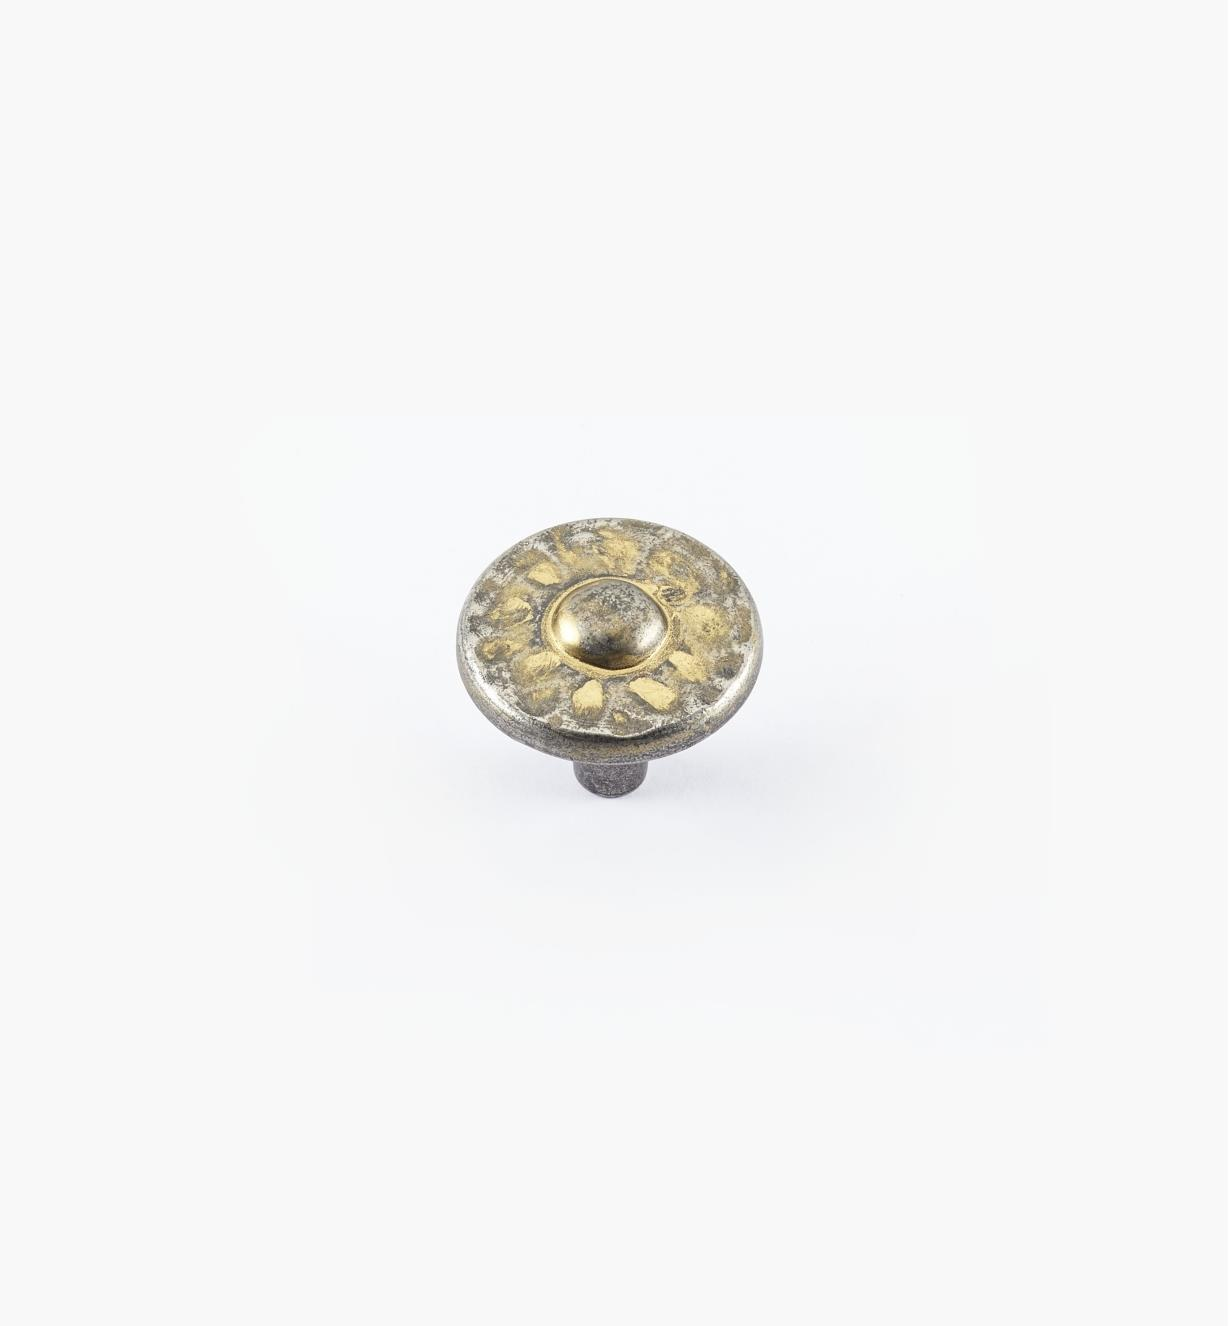 01W4913 - Bouton Nevada de 13/8po, fini étain bronzé